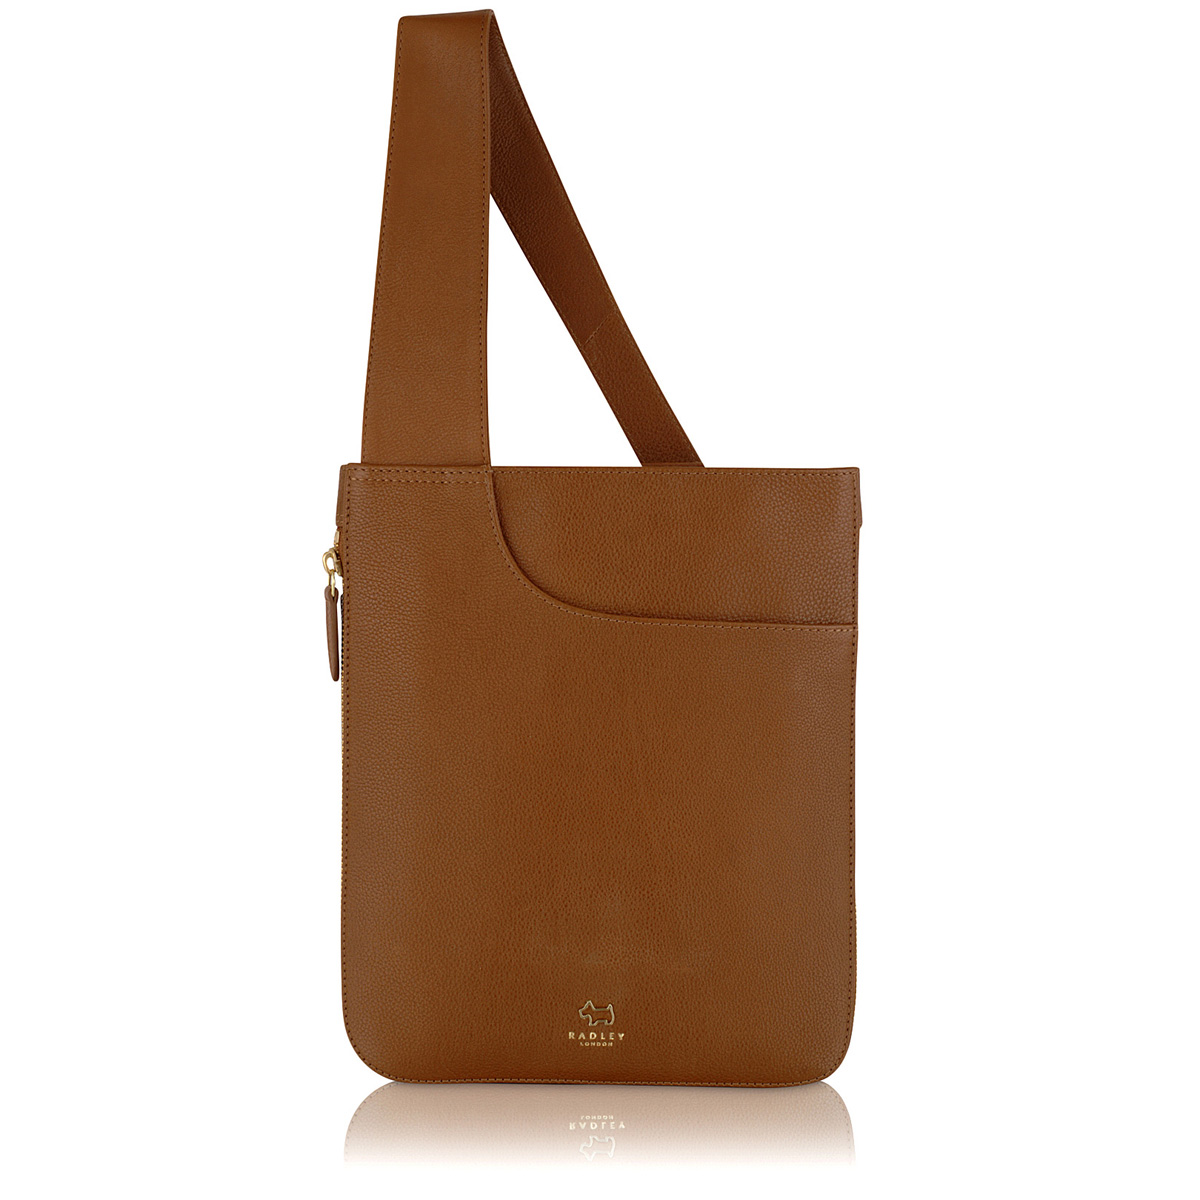 ... Radley Pockets Medium Zip Top Cross Body Bag AW17